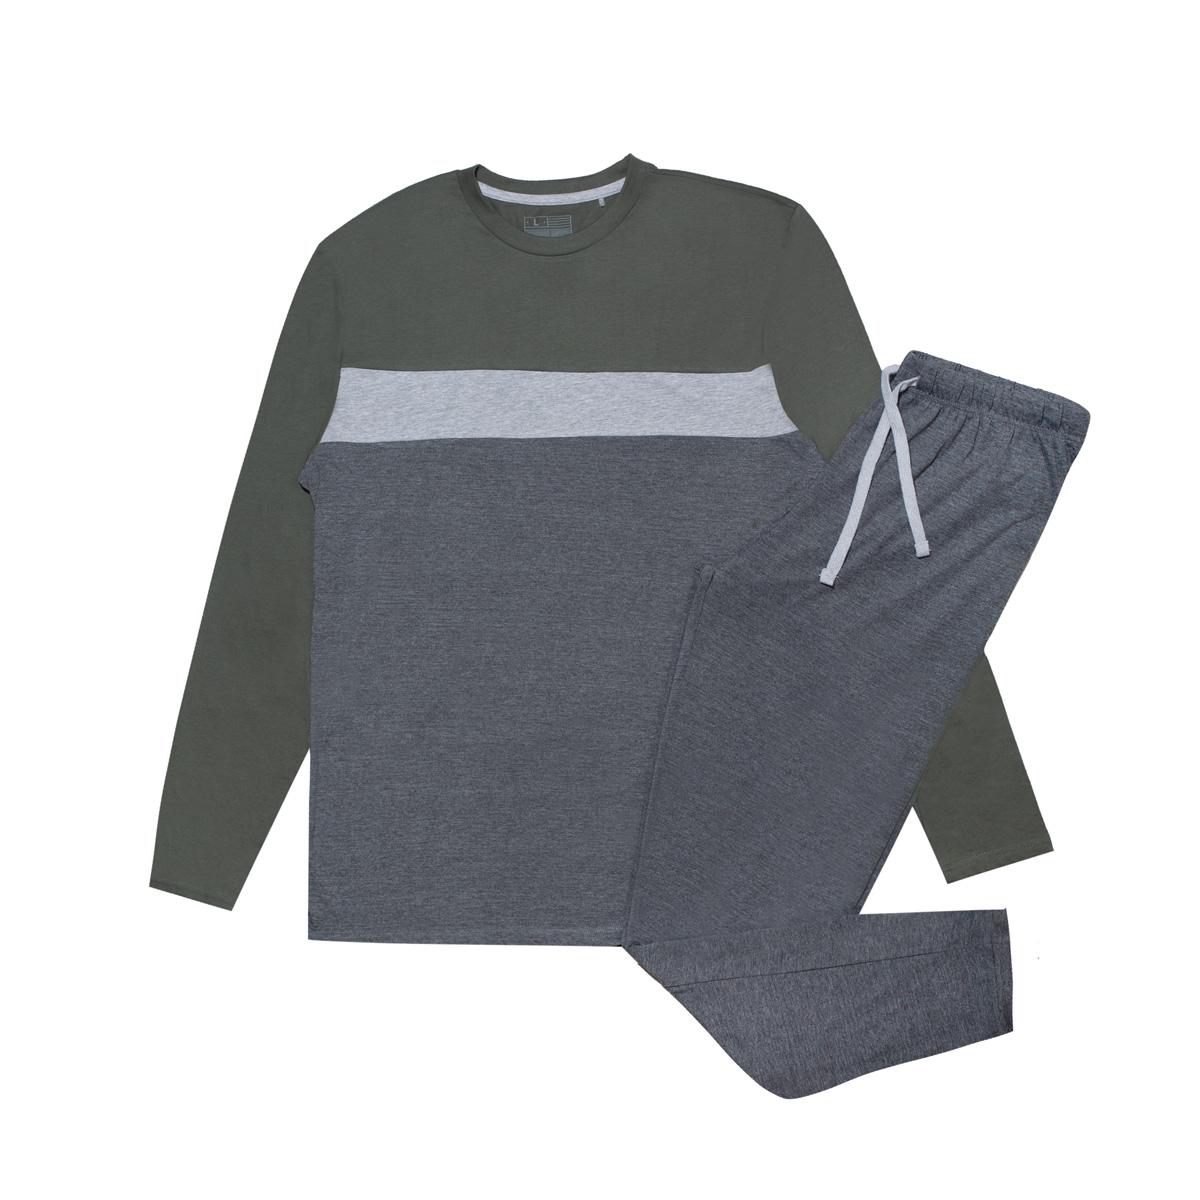 Moška pižama, temno melange siva